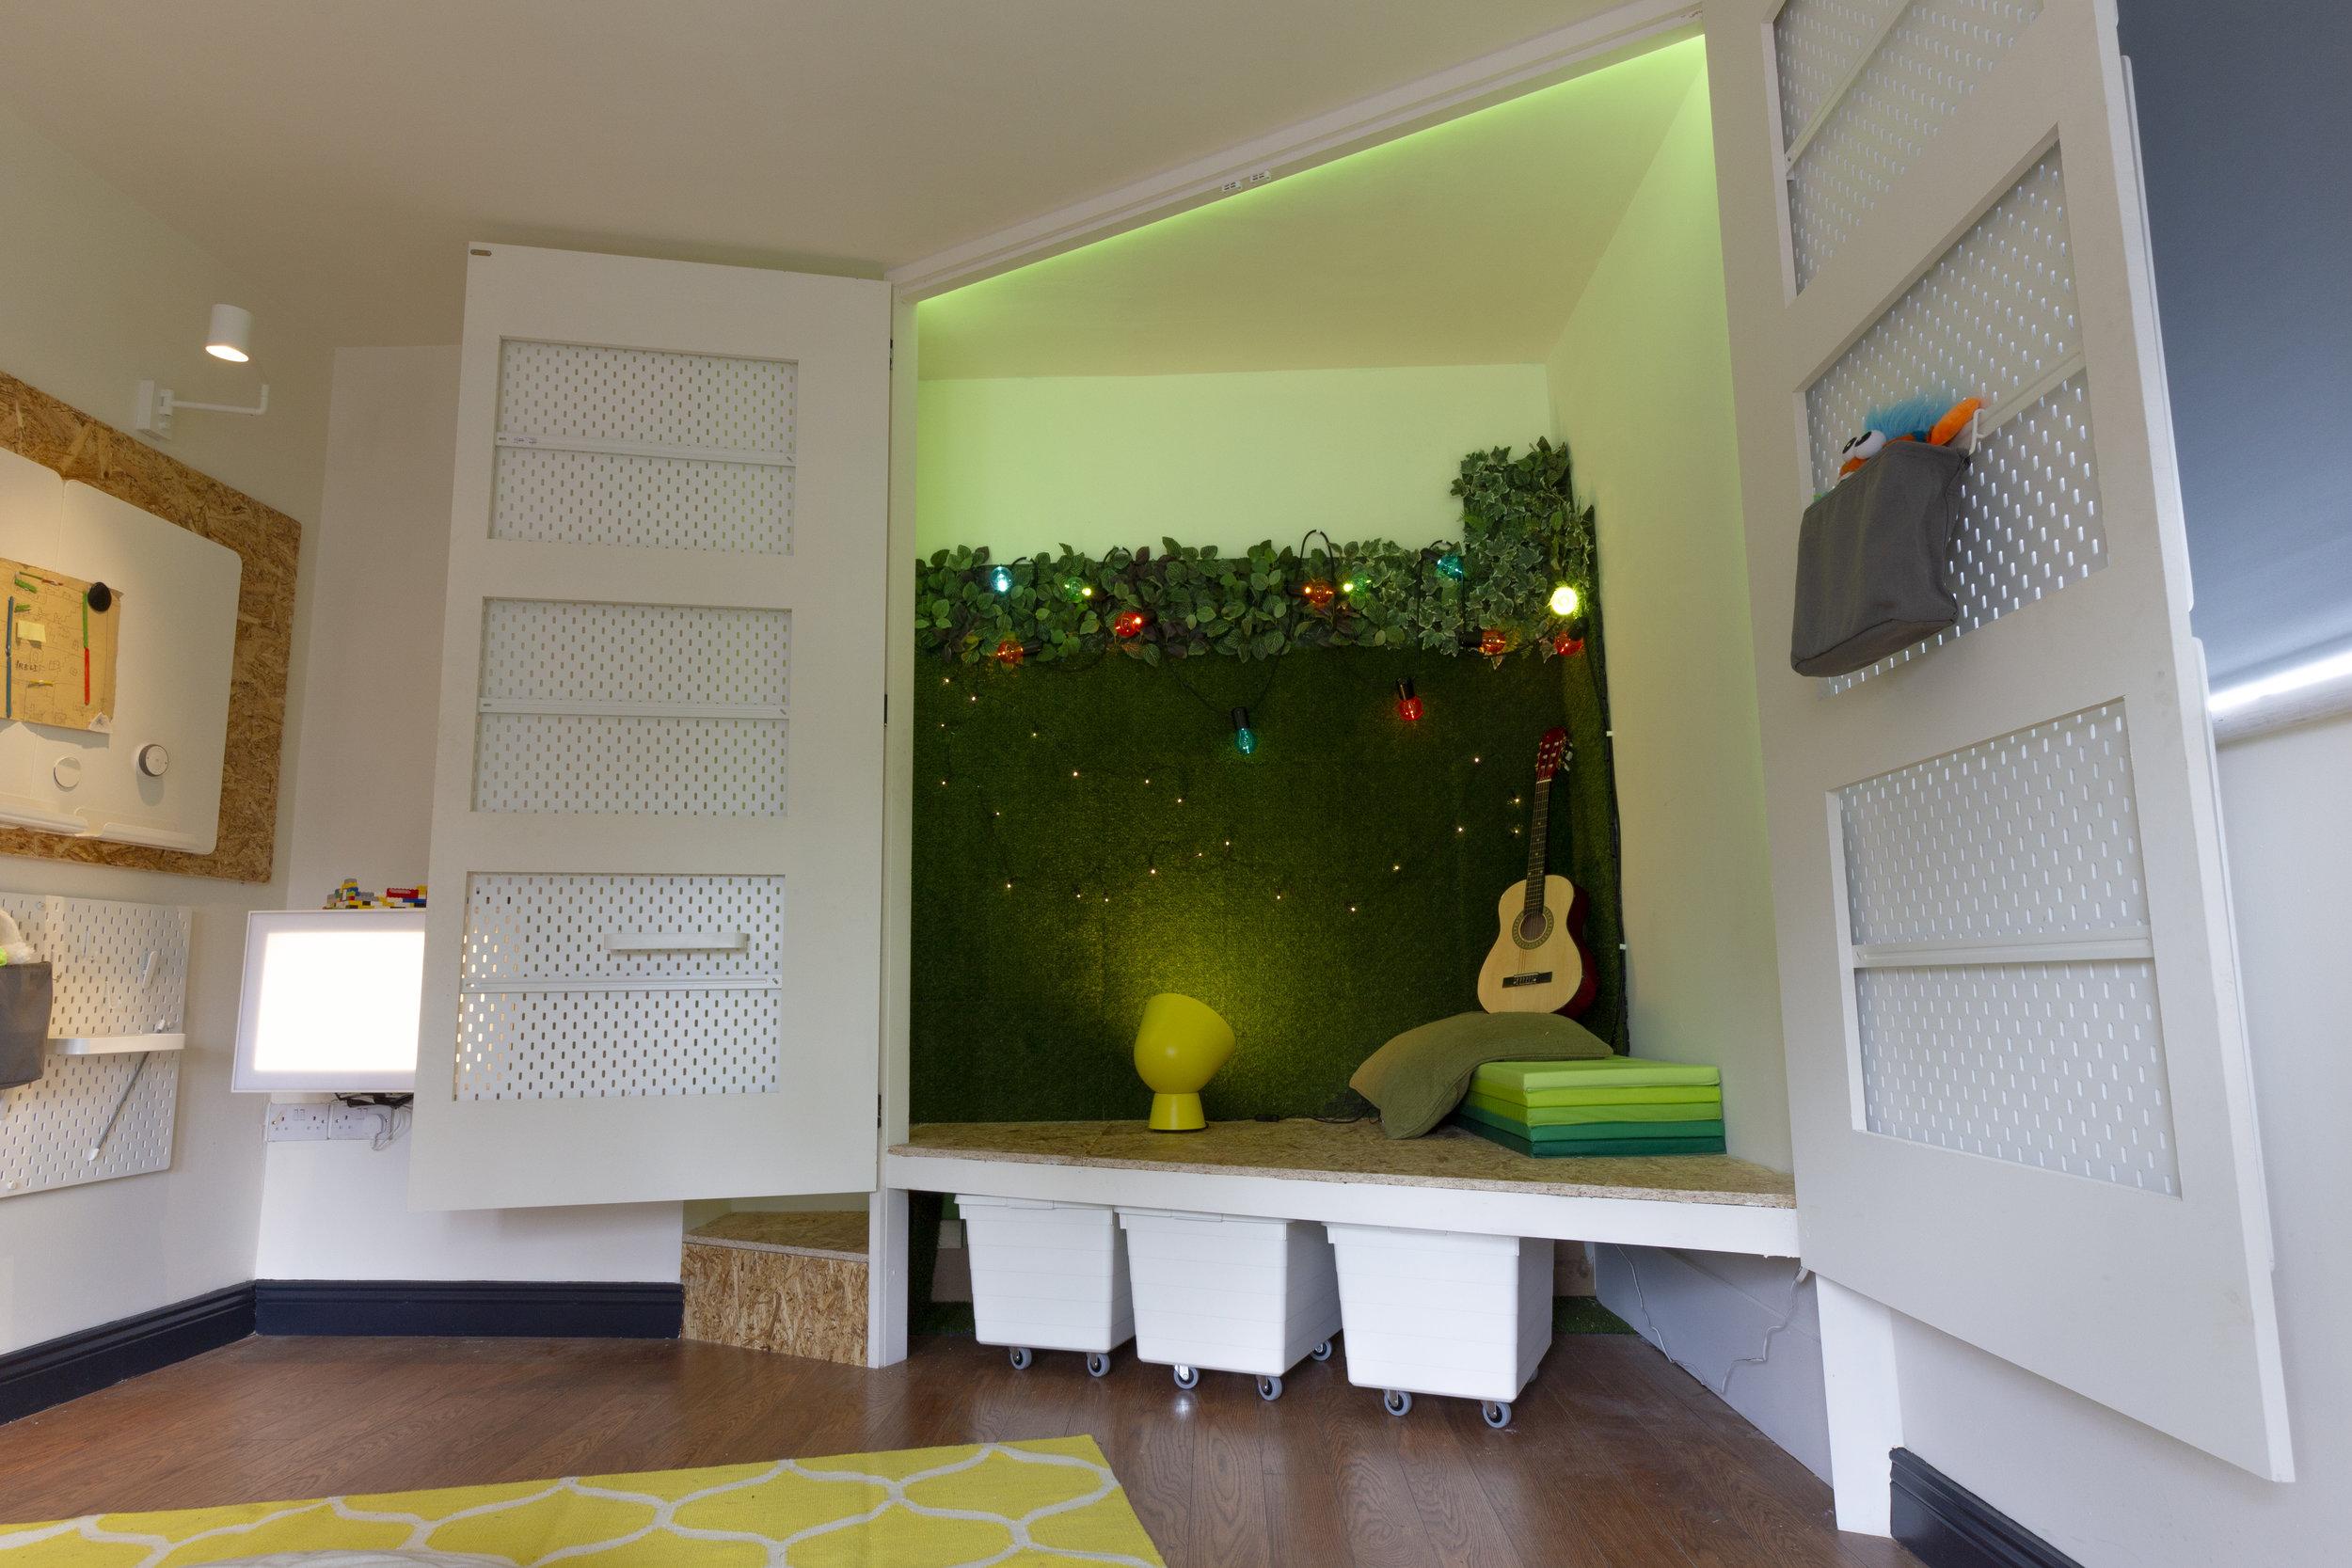 HR - The Curragh - After - Playroom 18.jpg